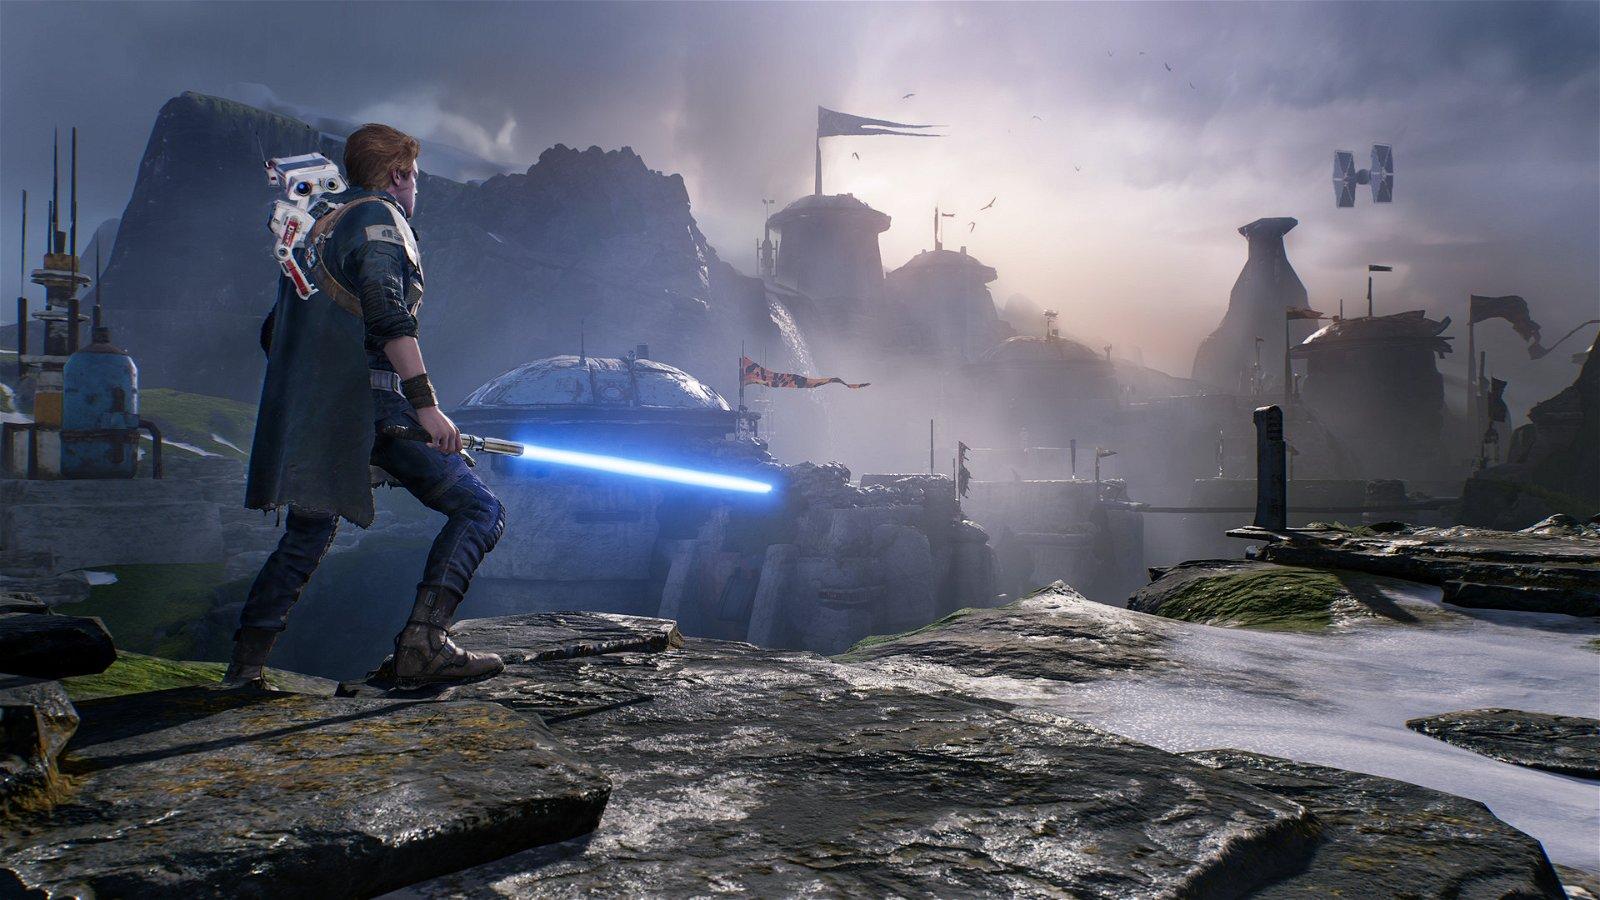 Star Wars Open World Game In Development With Ubisoft's Massive Entertainment